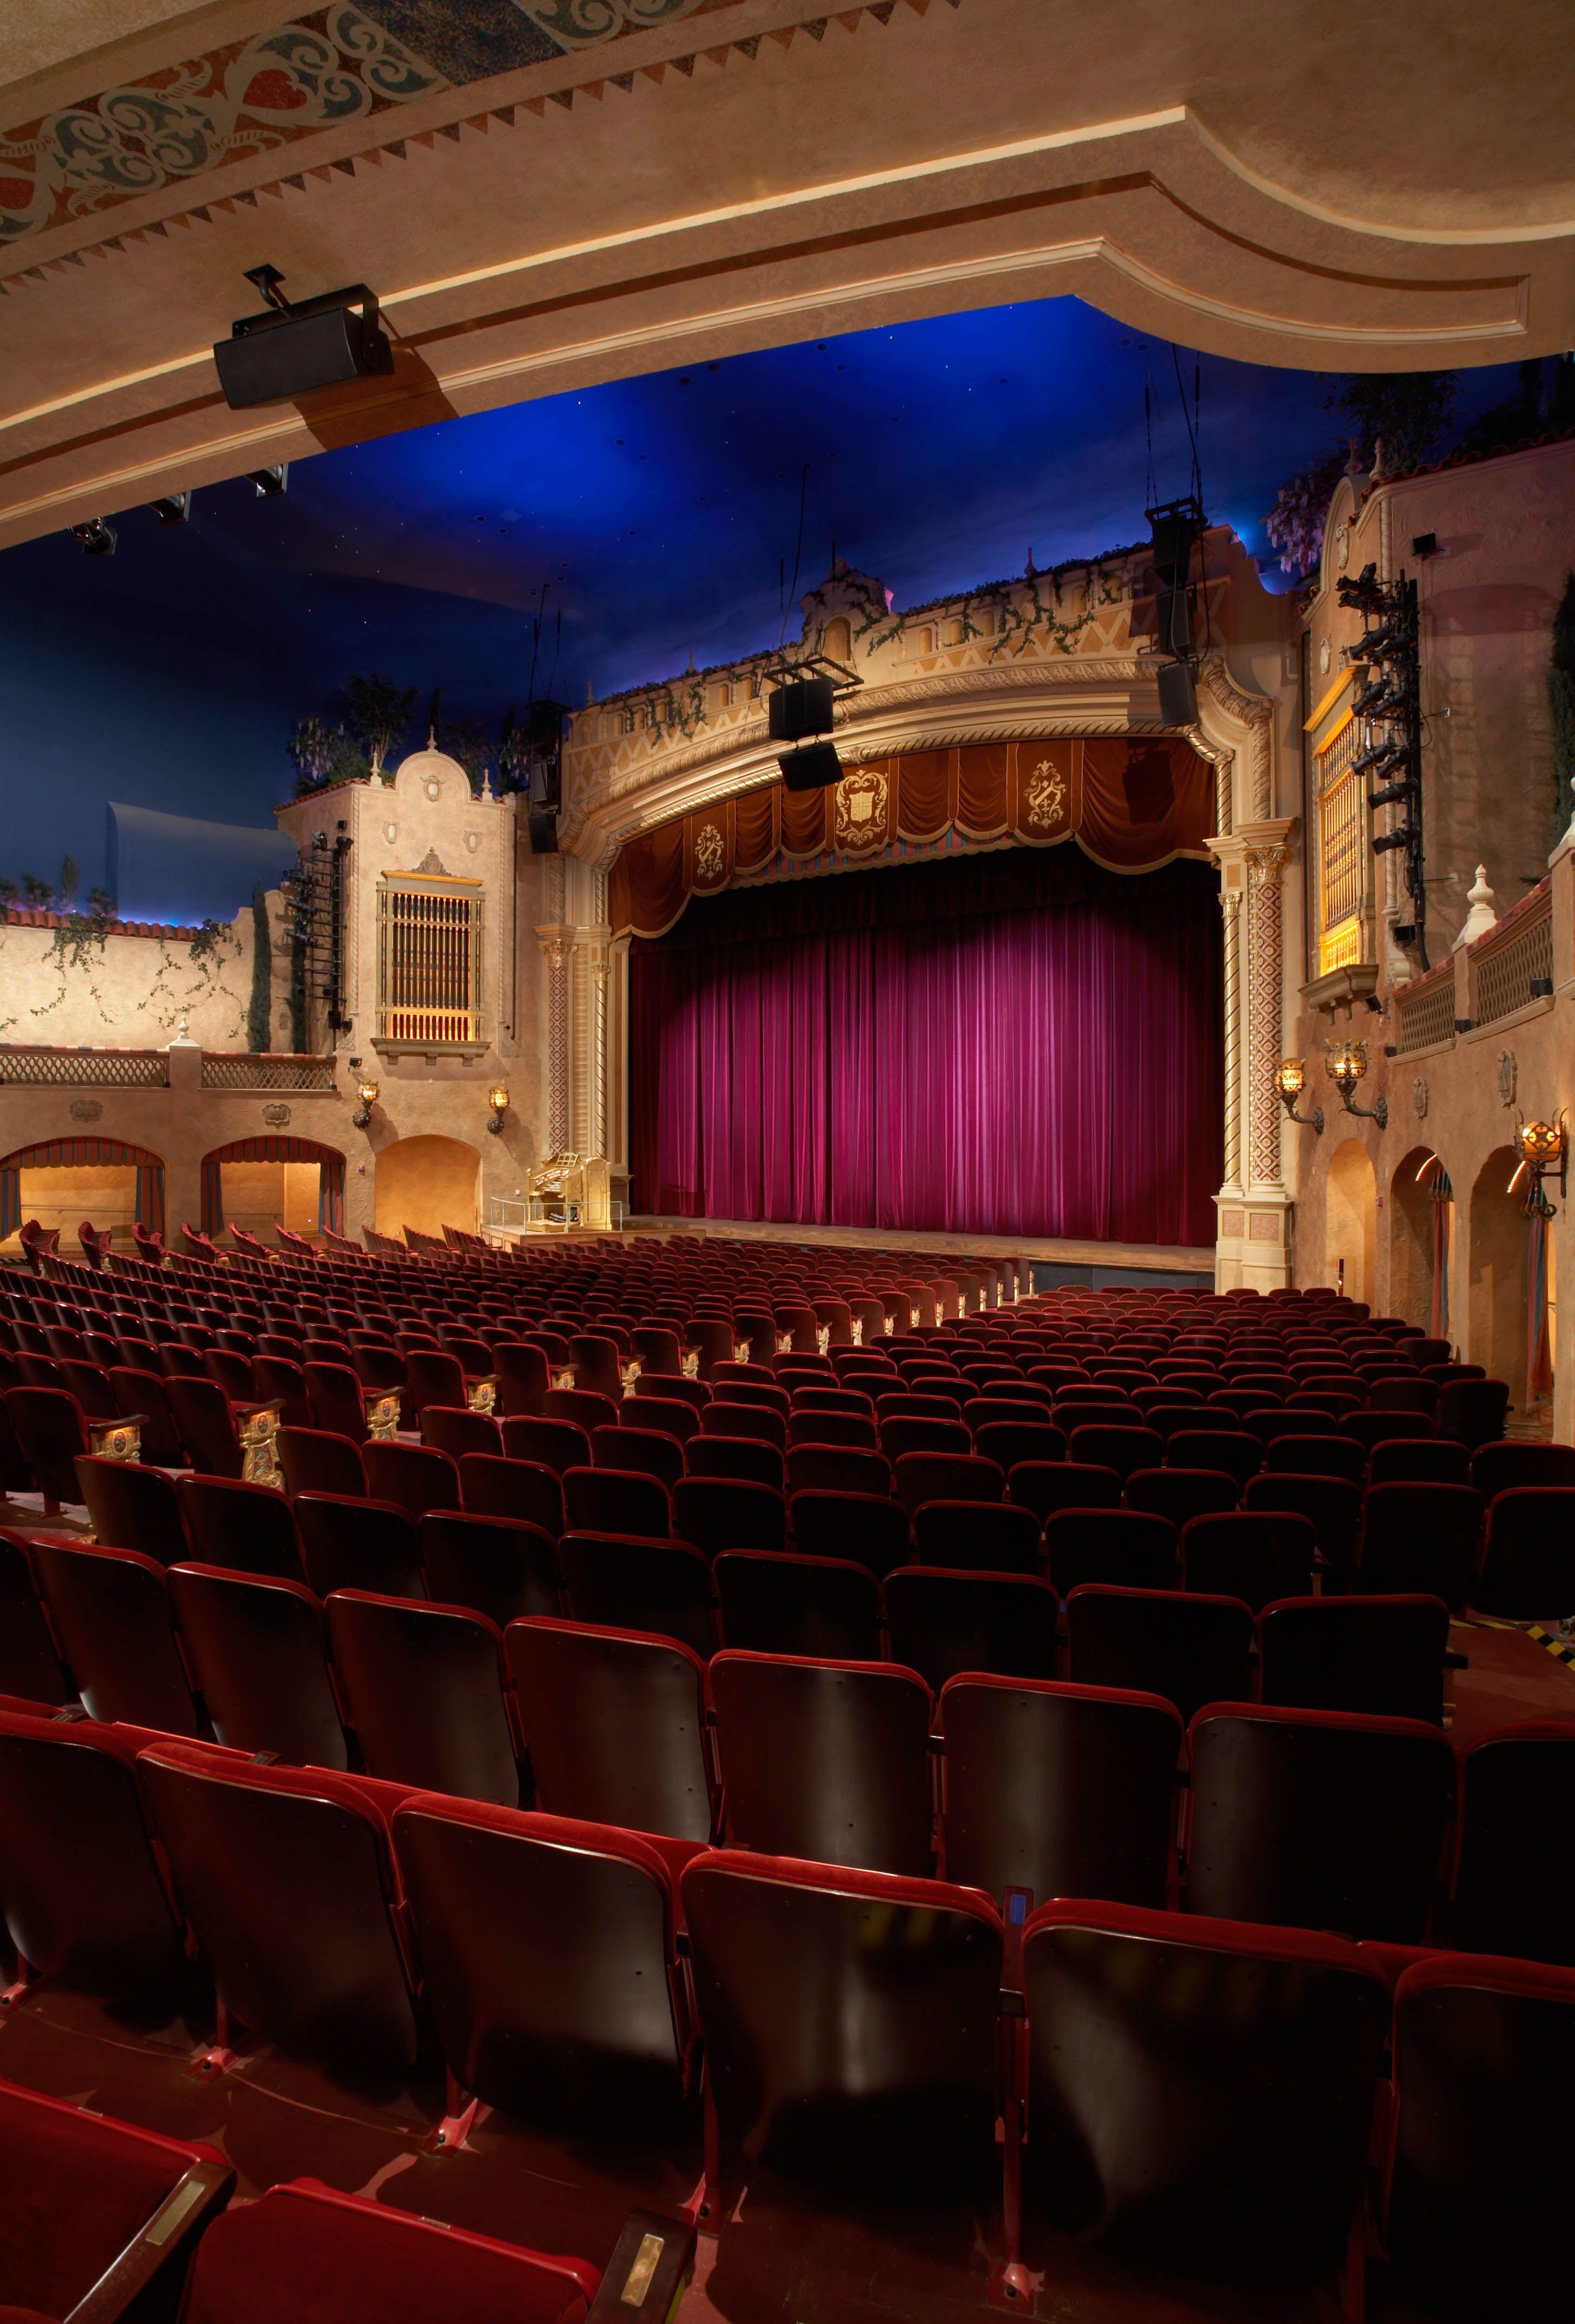 Plaza Theatre Performing Arts Center El Paso Tx Performance Art Performing Arts Center Auditorium Design